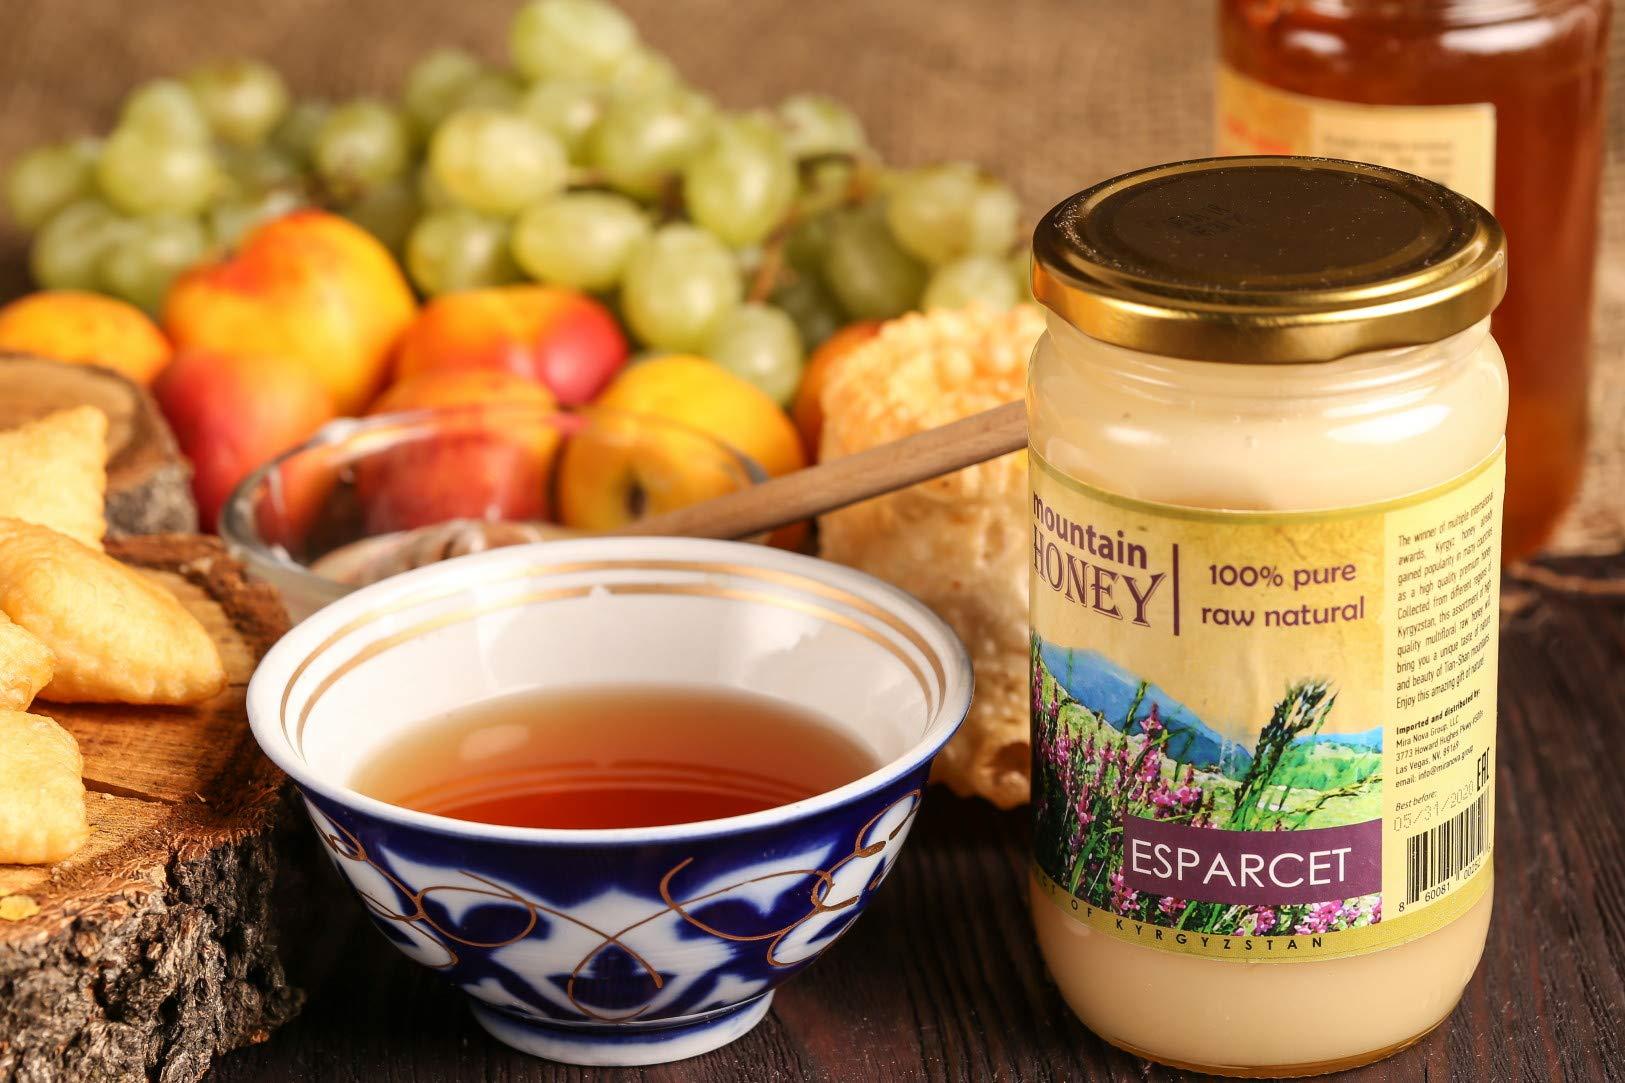 Kyrgyz Honey; Esparcet Raw Natural Sainfoin Mountain Honey; 17.63 Ounce Glass Jar by Mira Nova (Image #4)